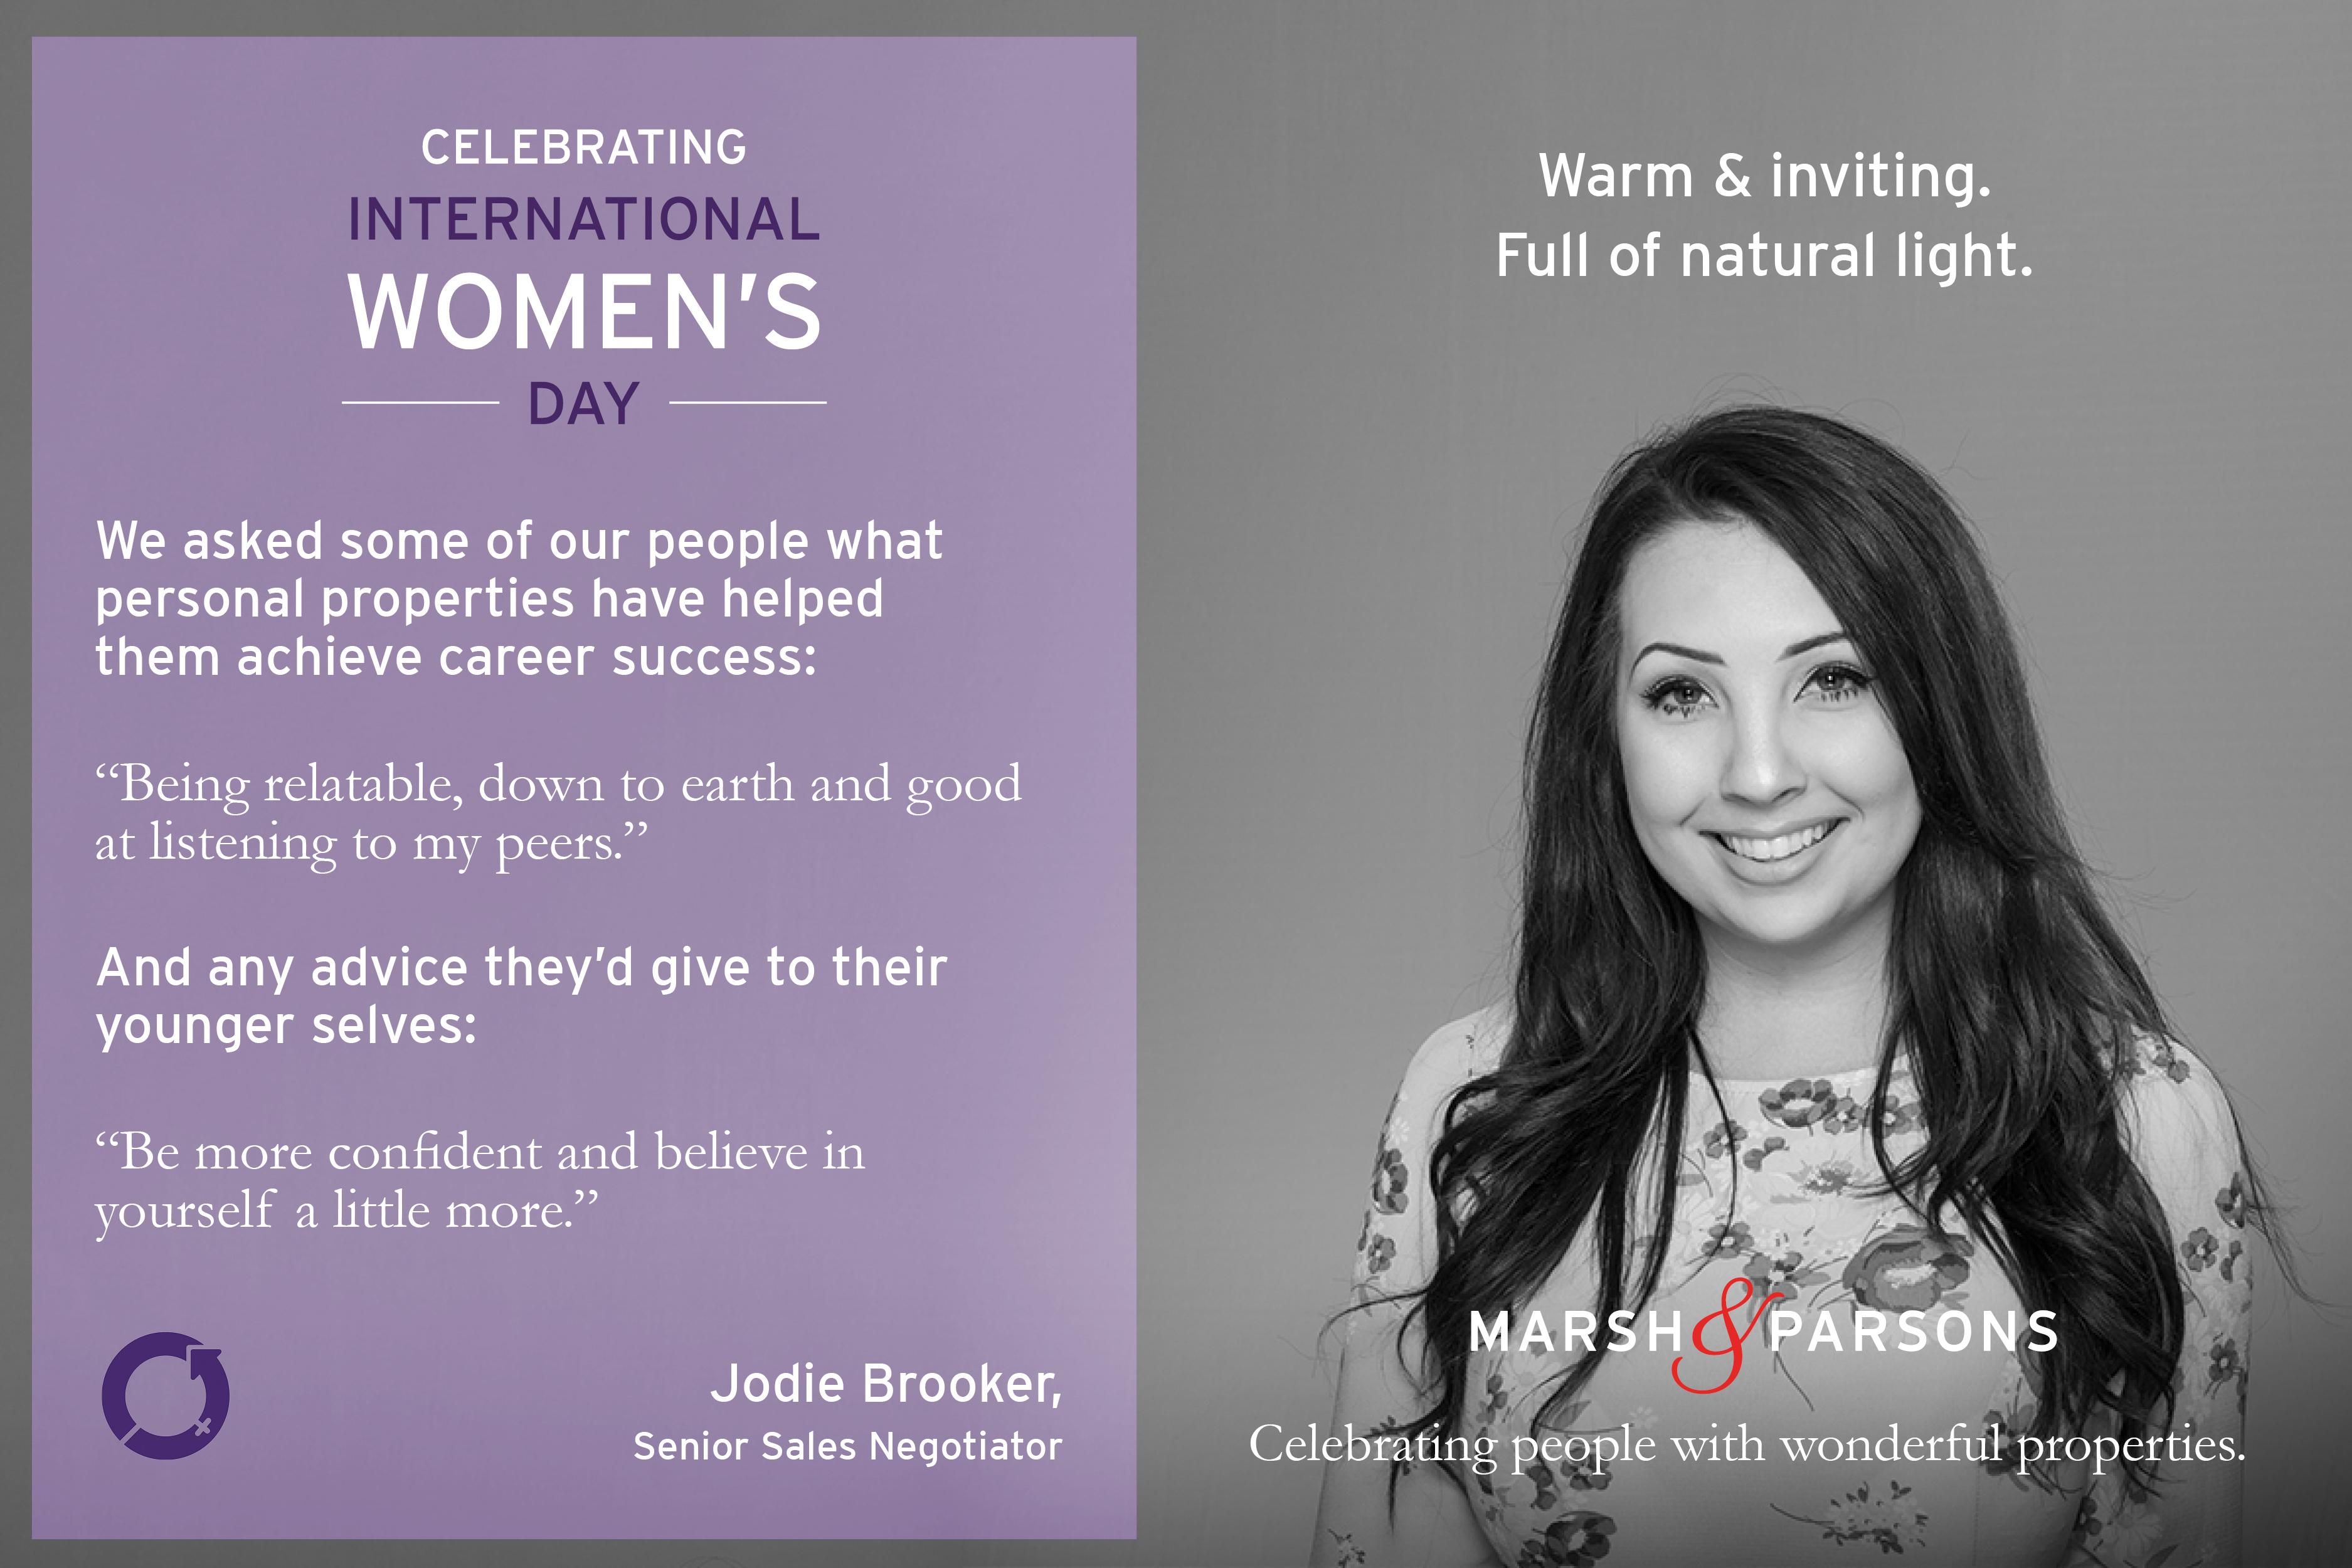 Jodie Brooker, International Women's Day